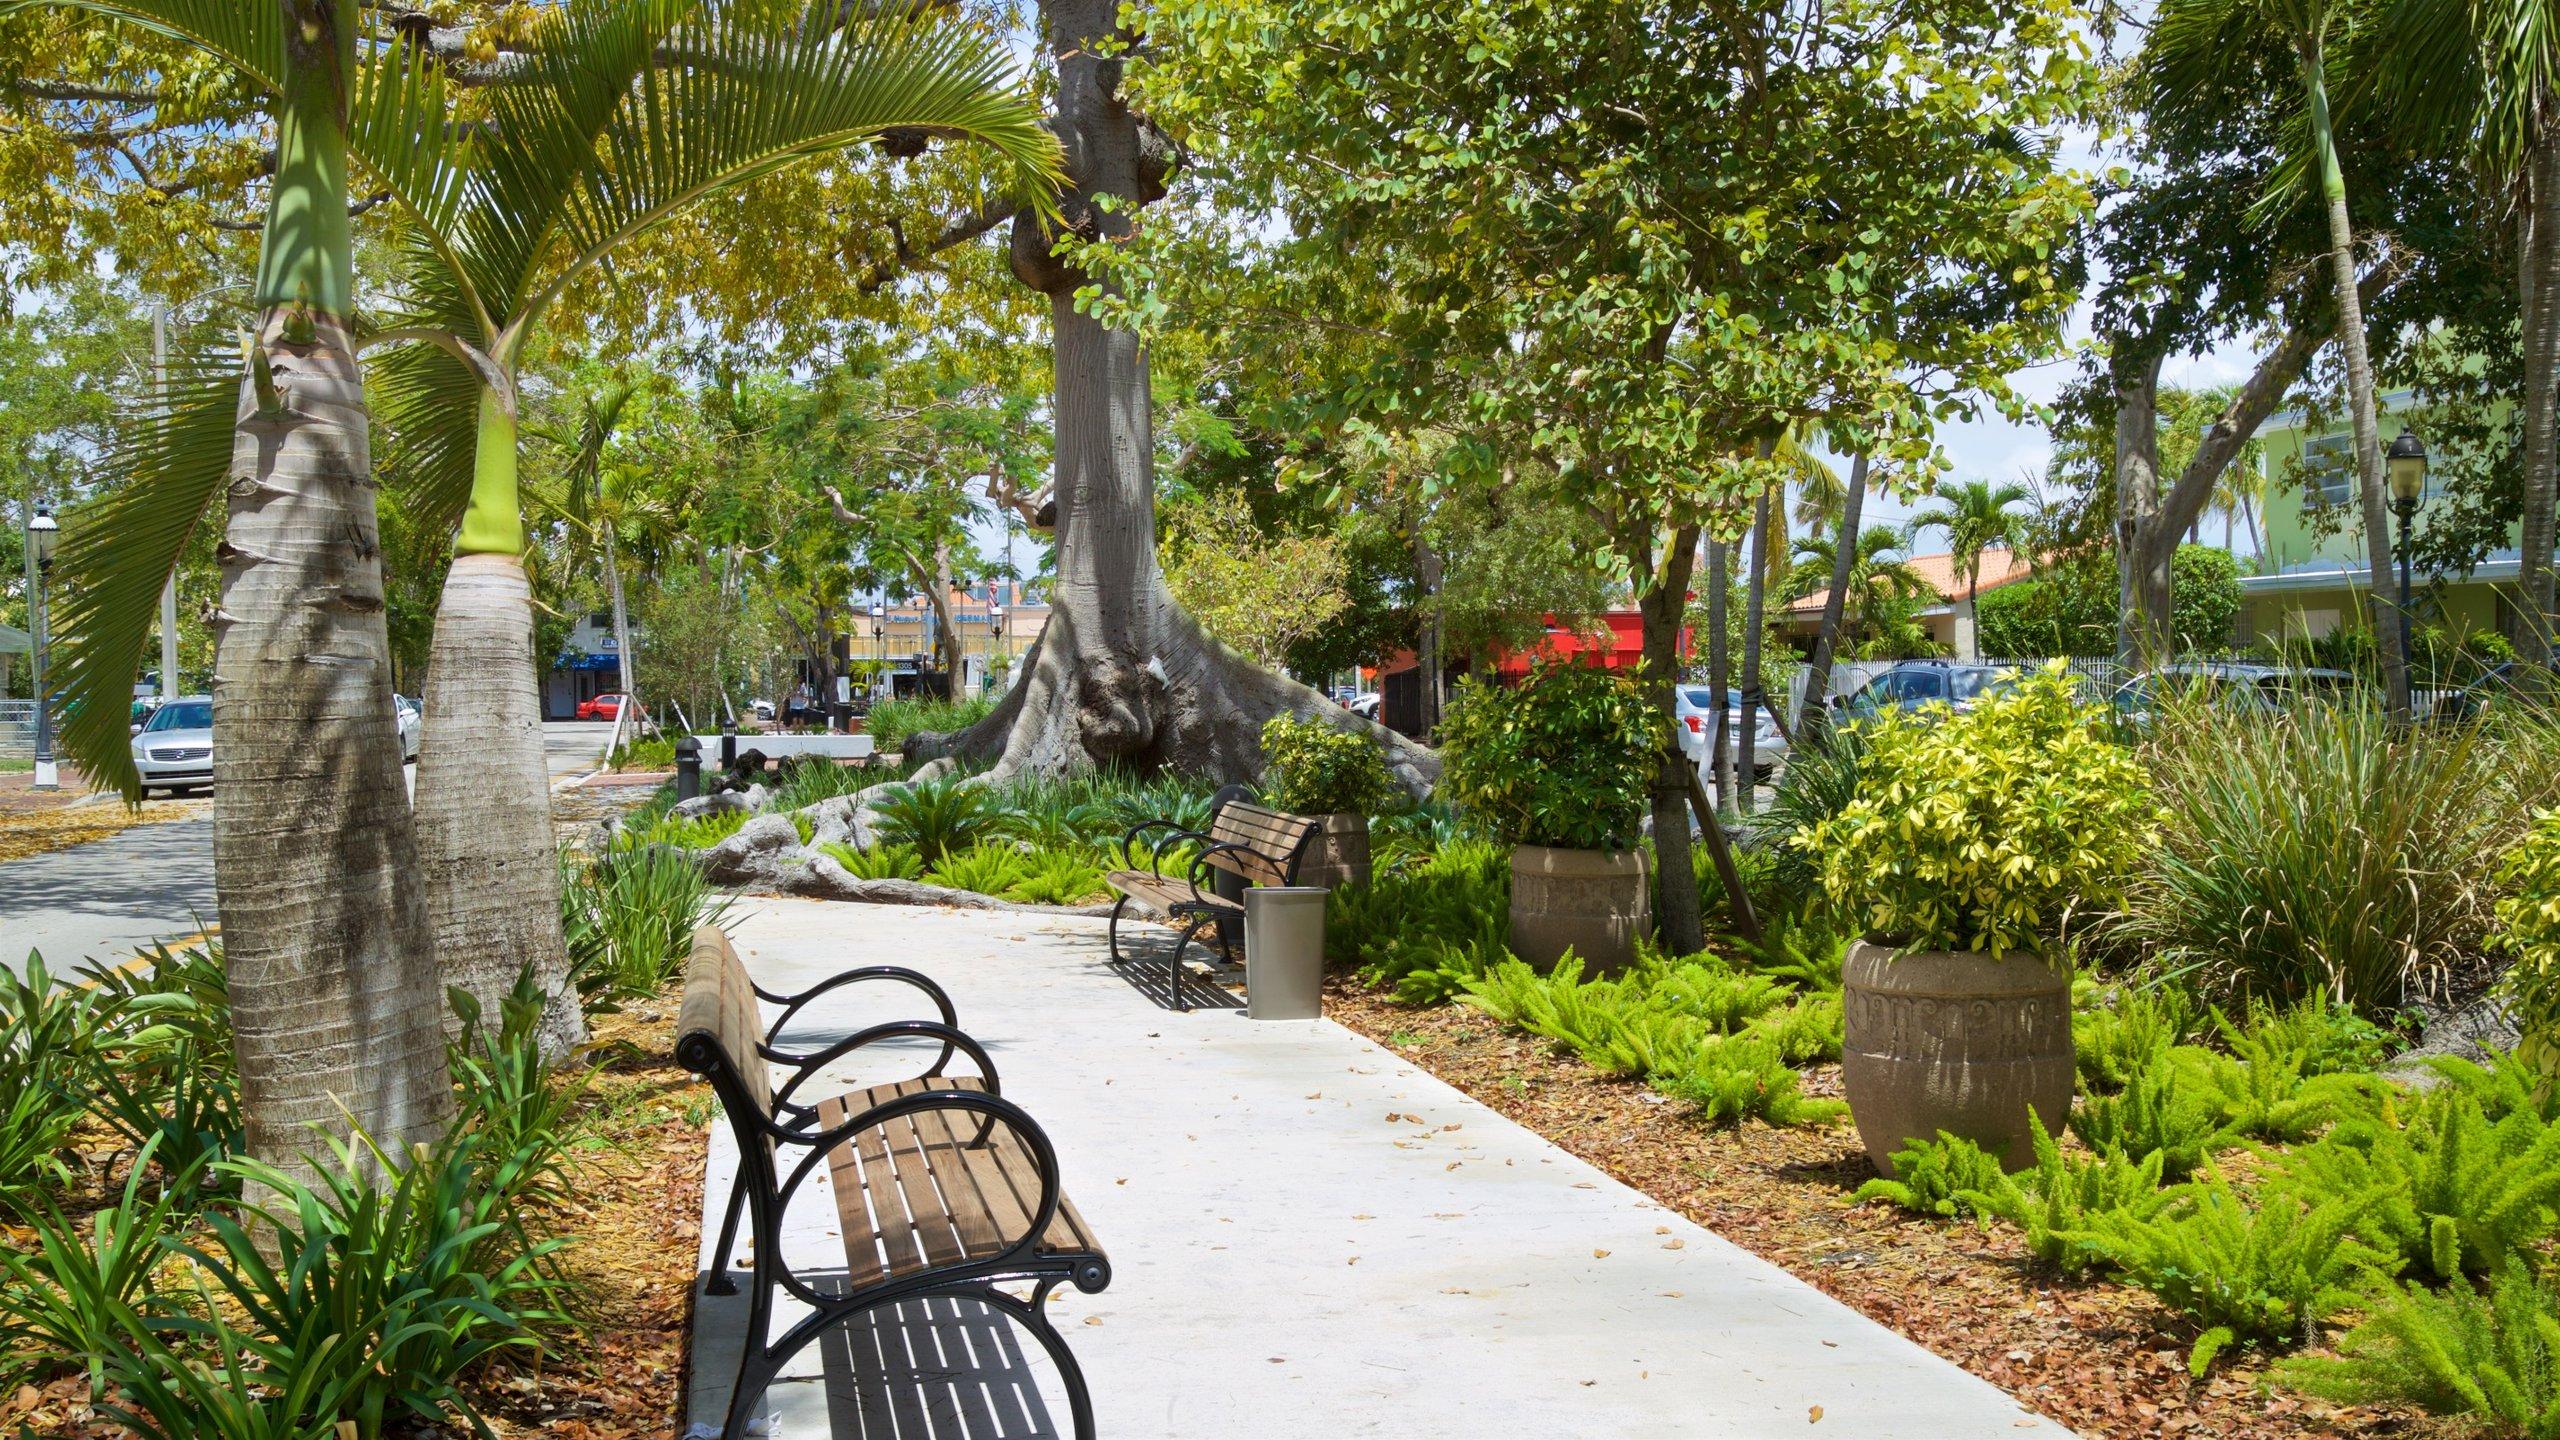 Coral Way, Miami, Florida, United States of America